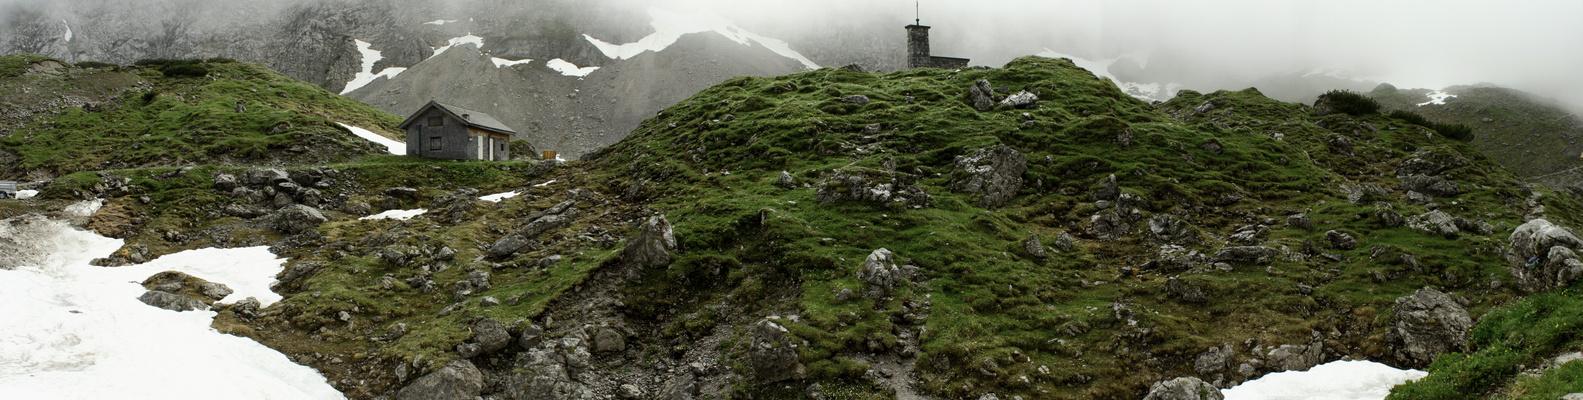 Hinter der Falkenhütte